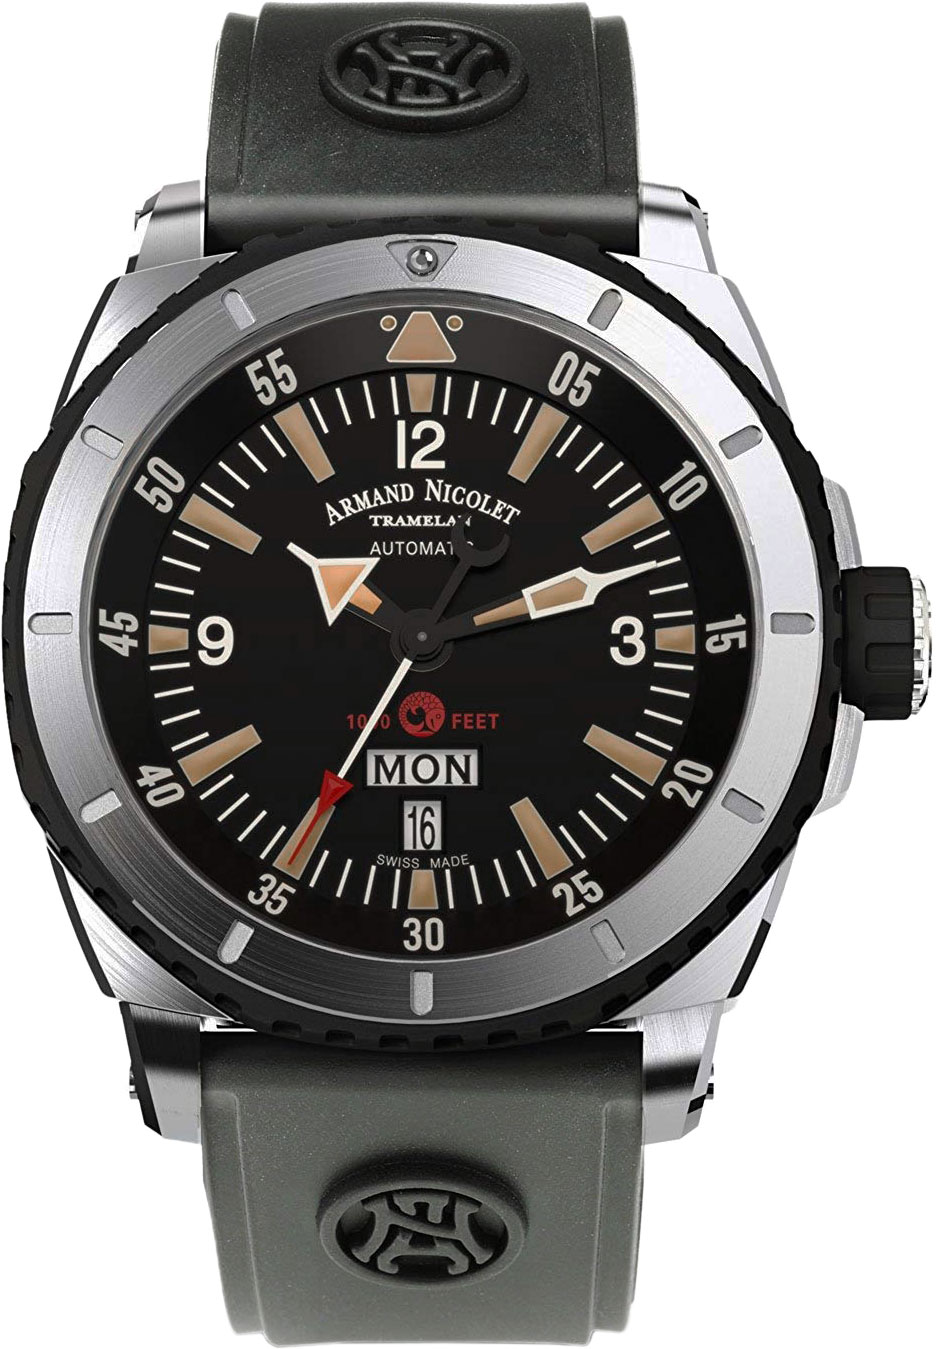 Мужские часы Armand Nicolet A713MGN-NR-G9610 мужские часы armand nicolet 9670a bu p670bu1